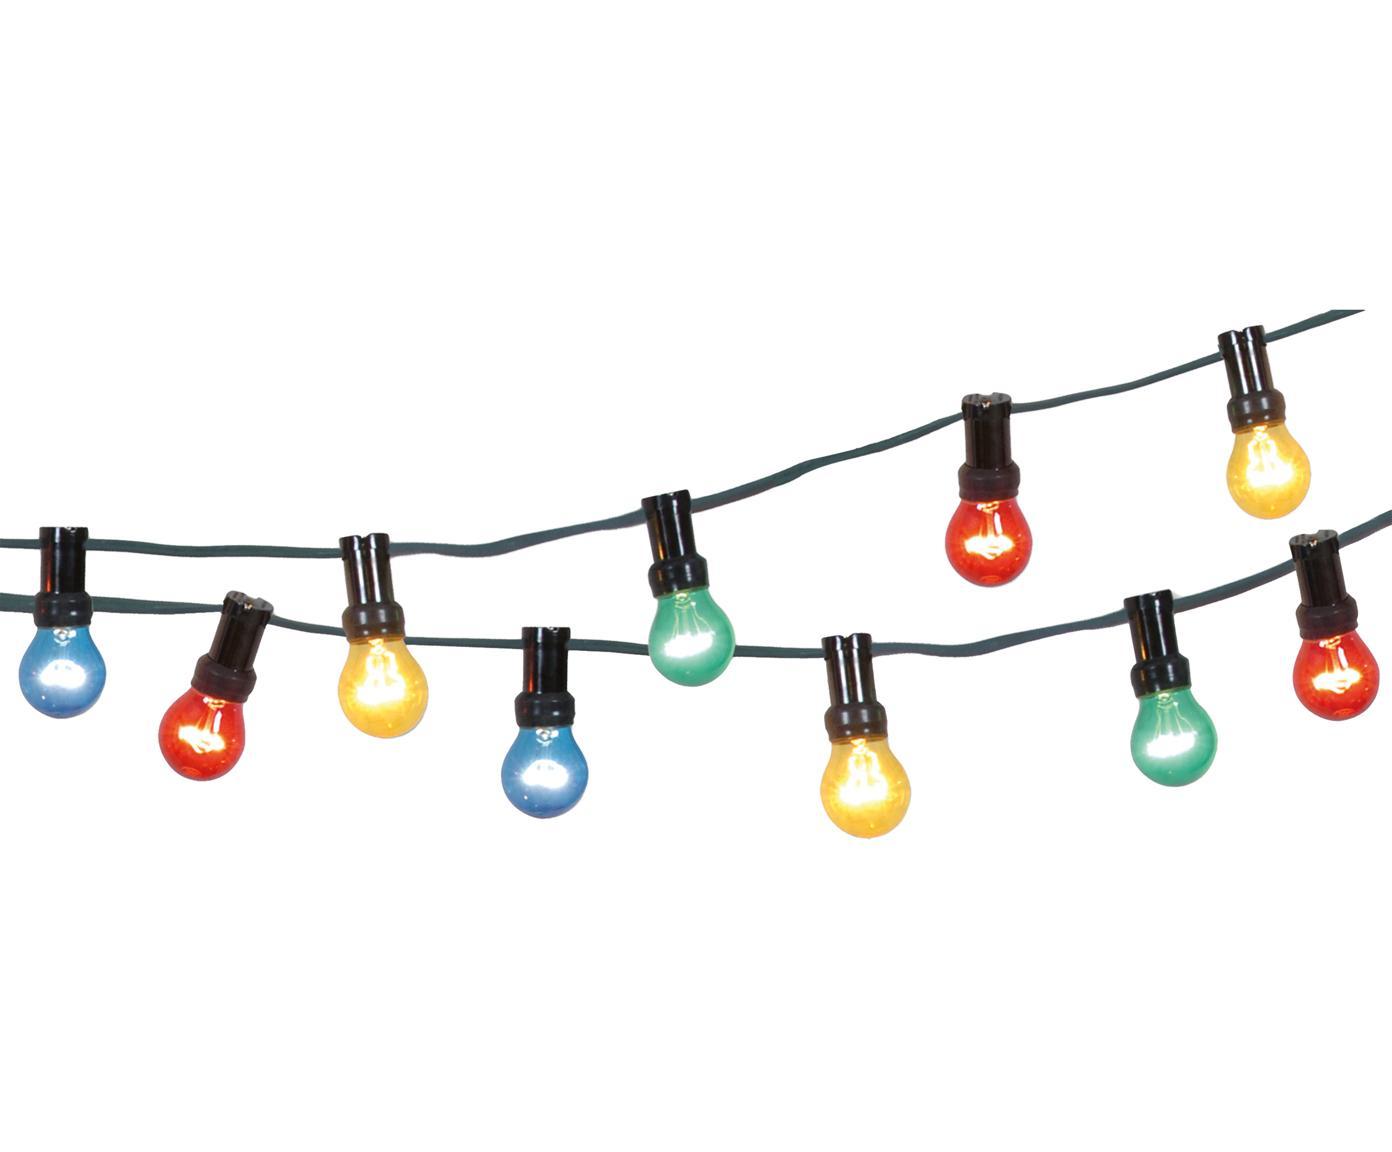 Lichtslinger Jubile, L 620 cm, Kunststof, Multicolour, L 620 cm